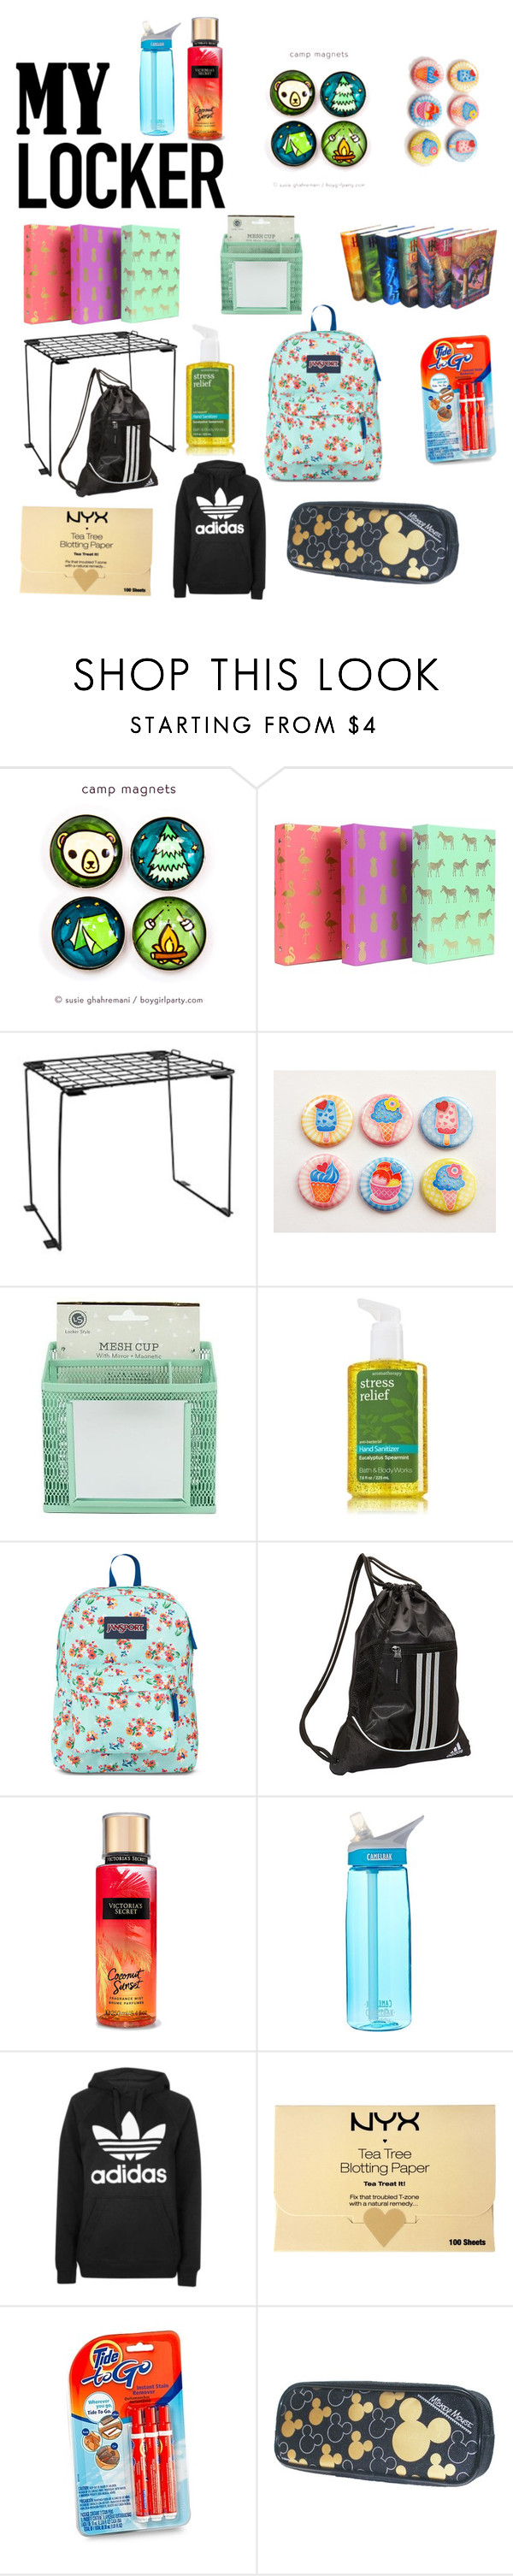 """Locker"" by berrycake18 ❤ liked on Polyvore featuring interior, interiors, interior design, home, home decor, interior decorating, JanSport, adidas, CamelBak and Topshop"